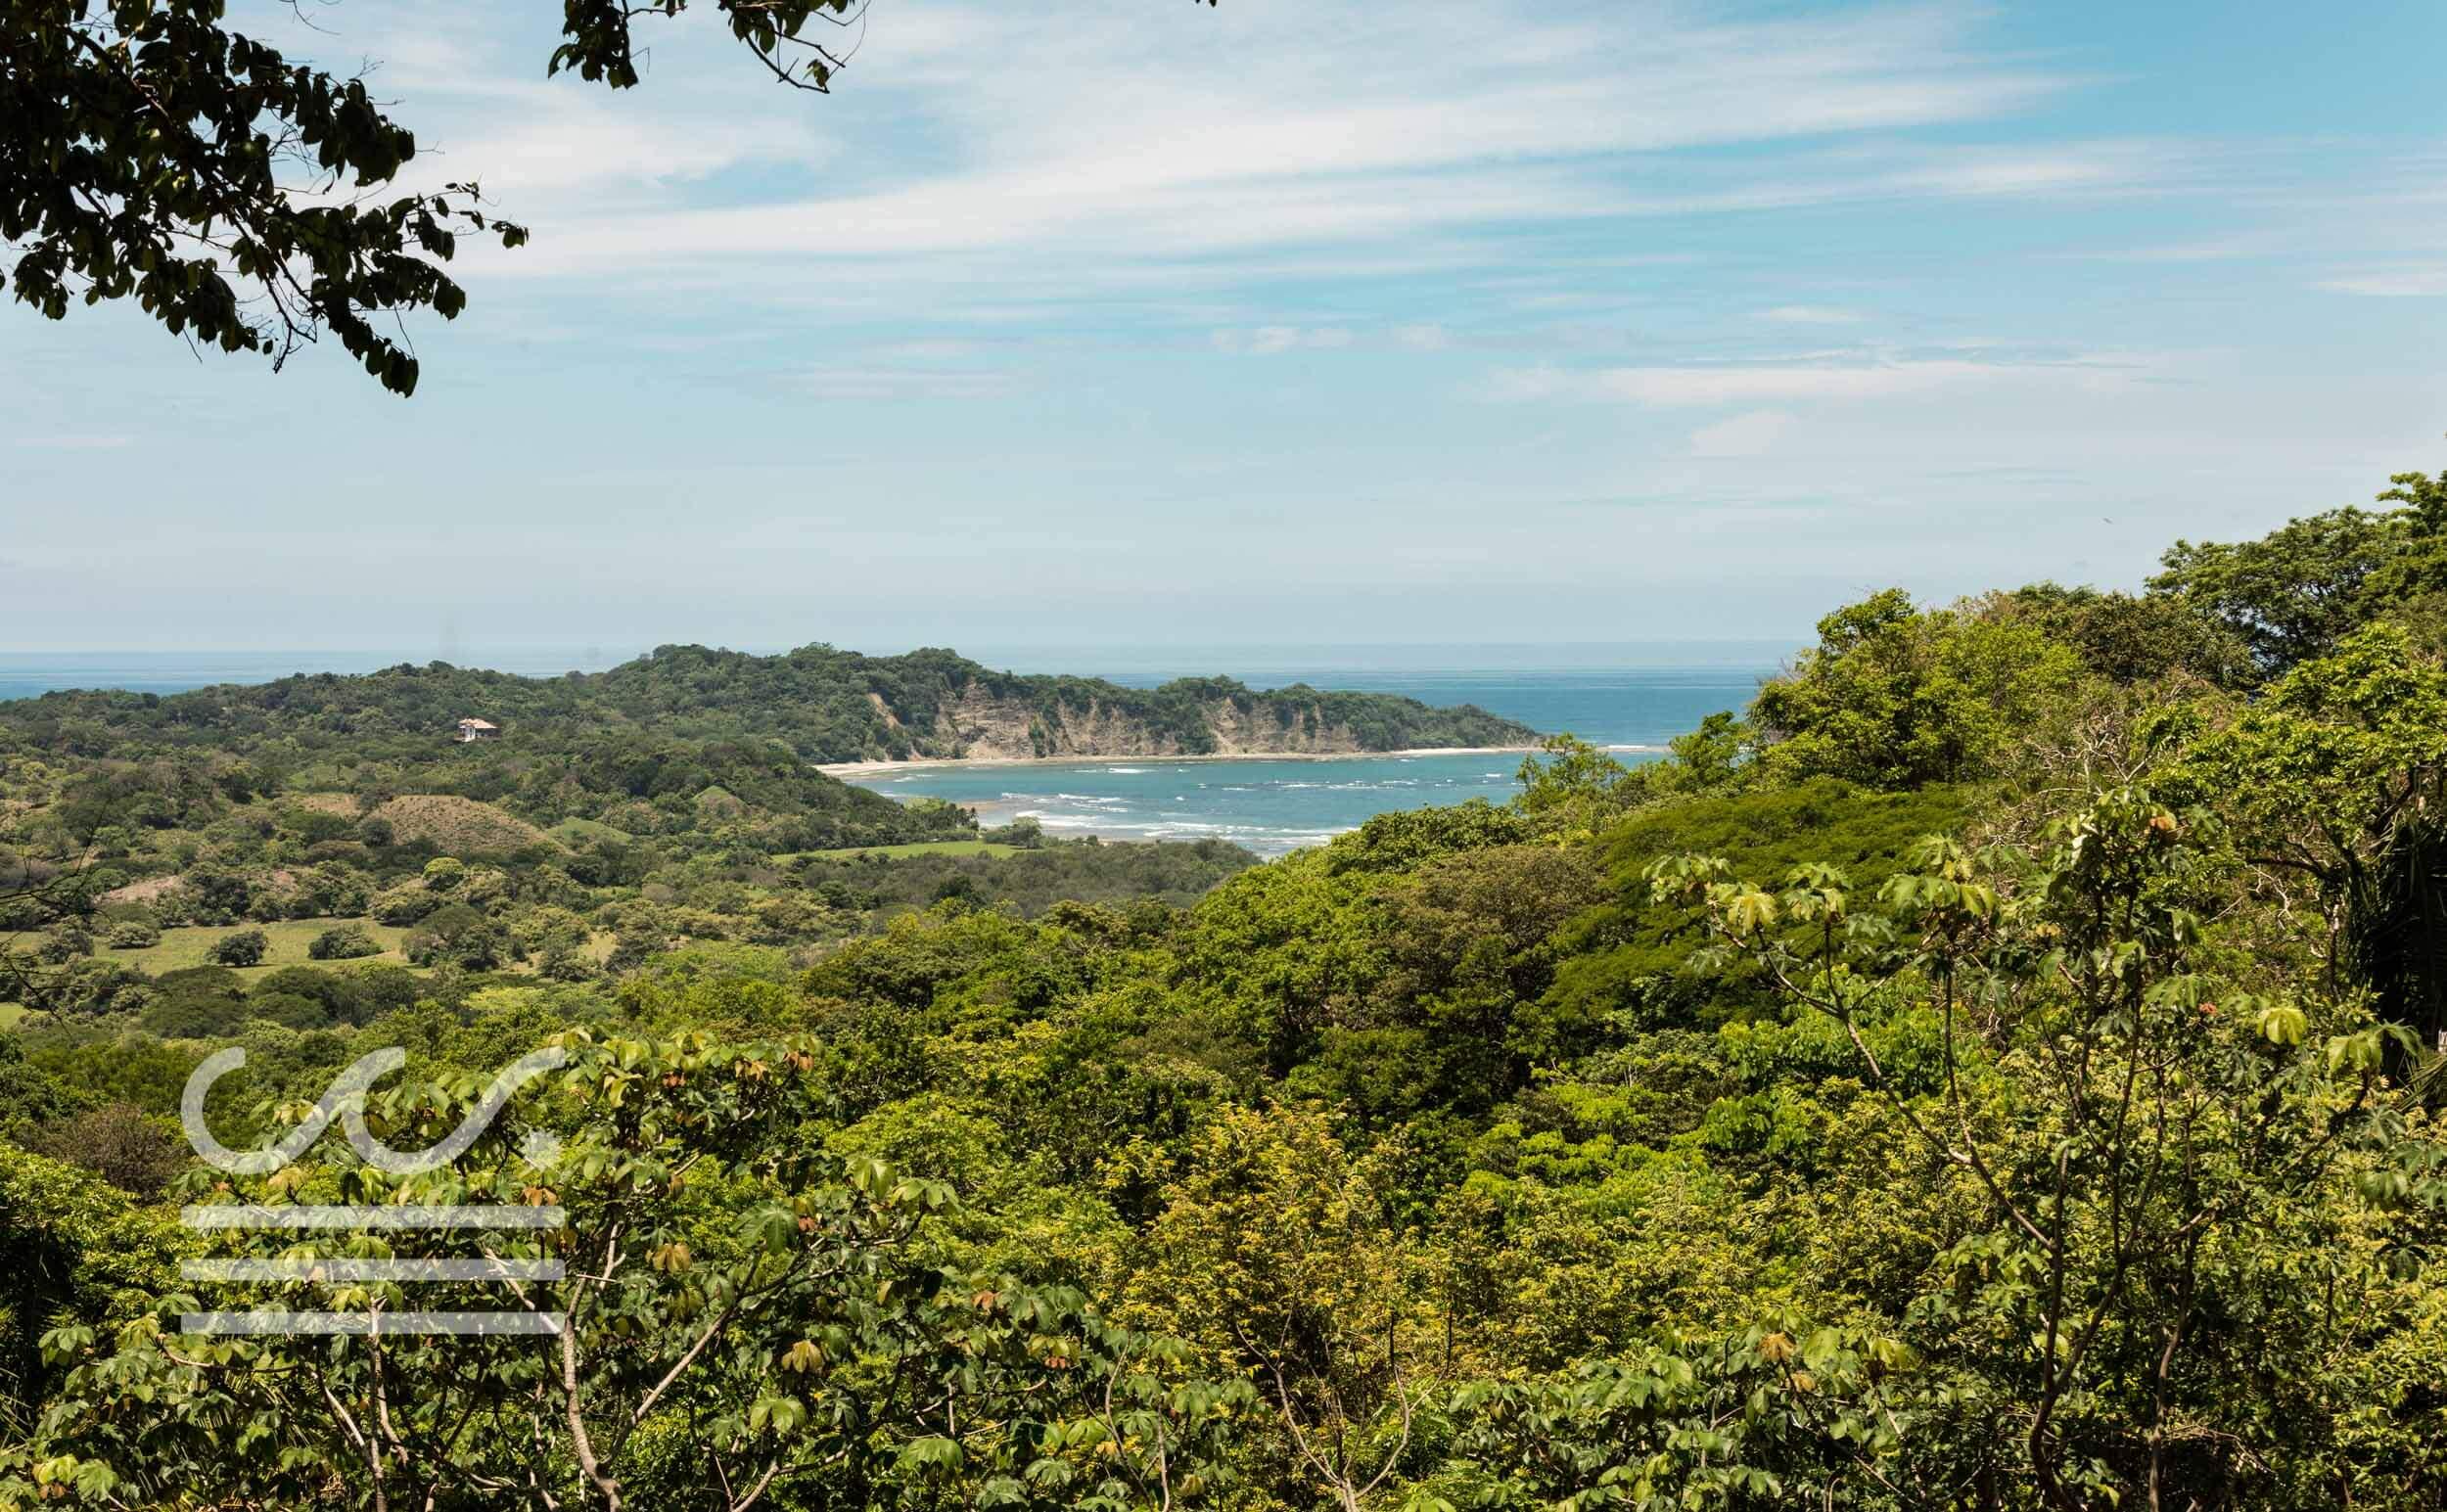 EE-102-Lot-Wanderlust-Realty-Real-Estate-Nosara-Costa-Rica-2.jpg